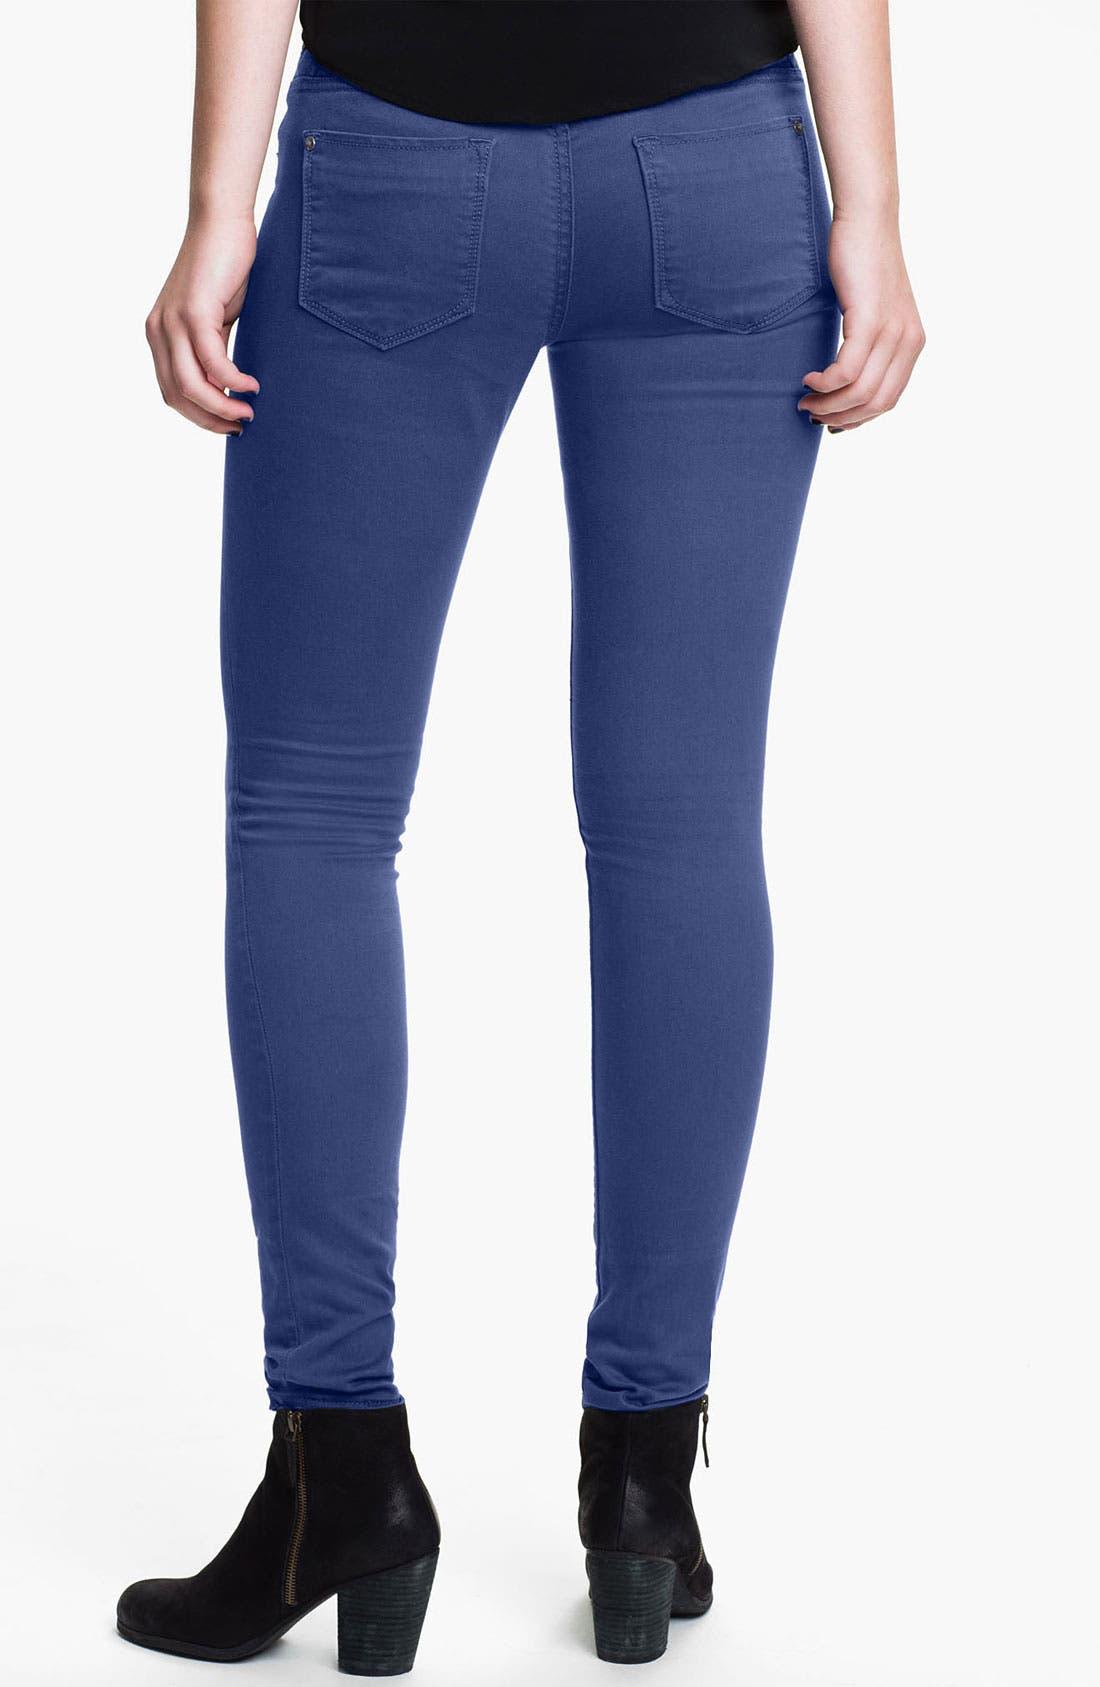 Alternate Image 1 Selected - Vigoss Color Skinny Jeans (Juniors) (Online Exclusive)